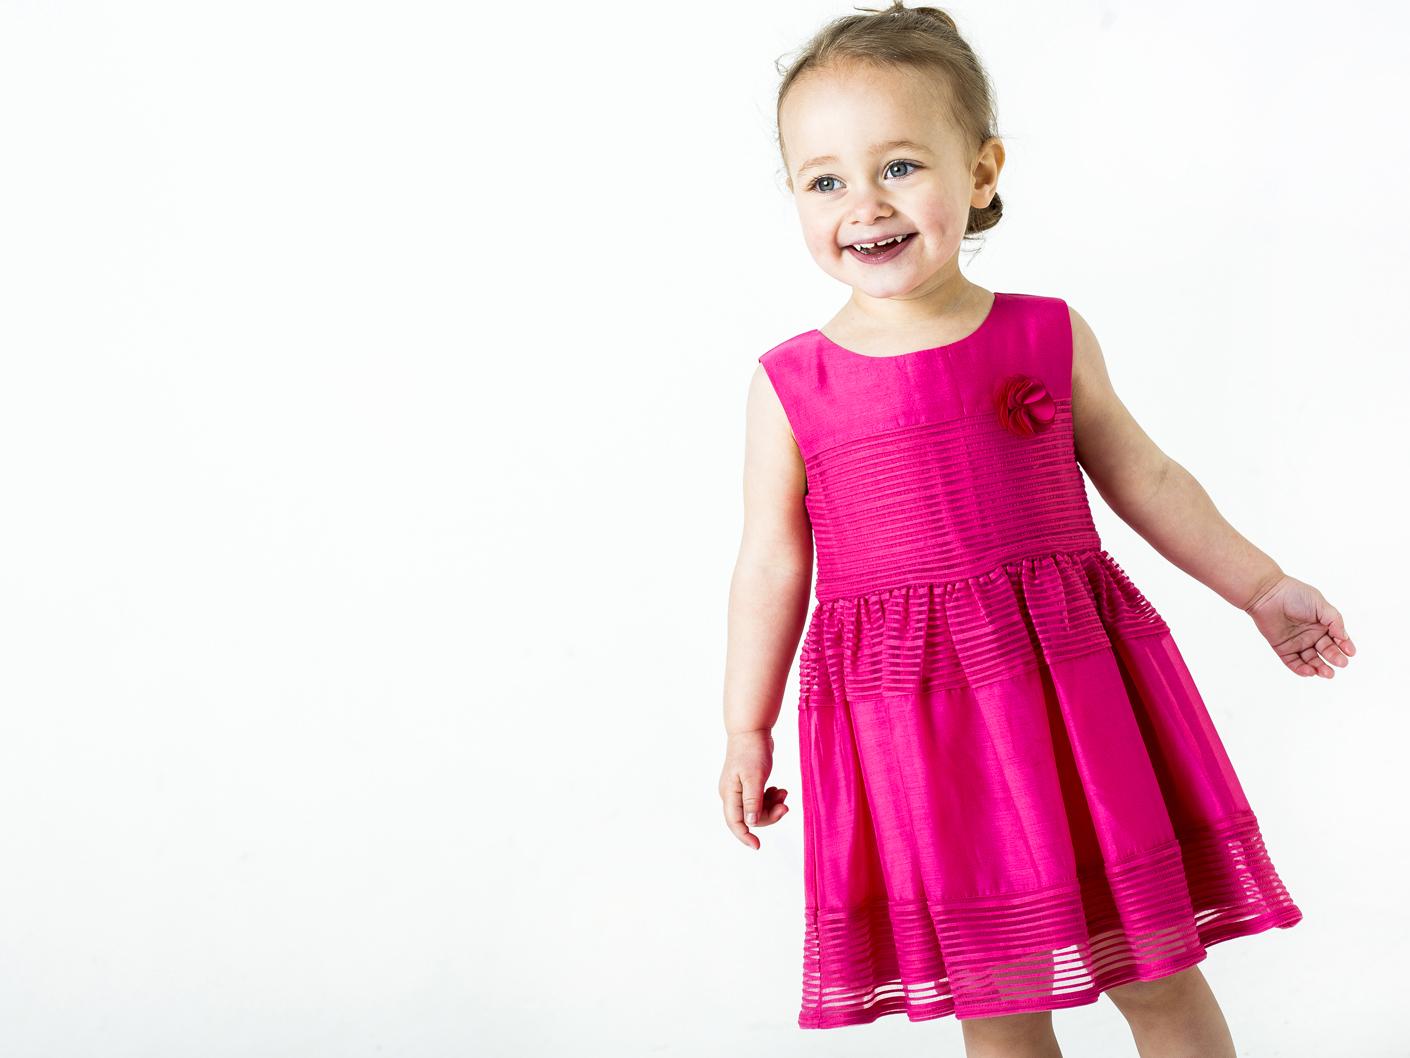 kids-fashion-photographer-manchester